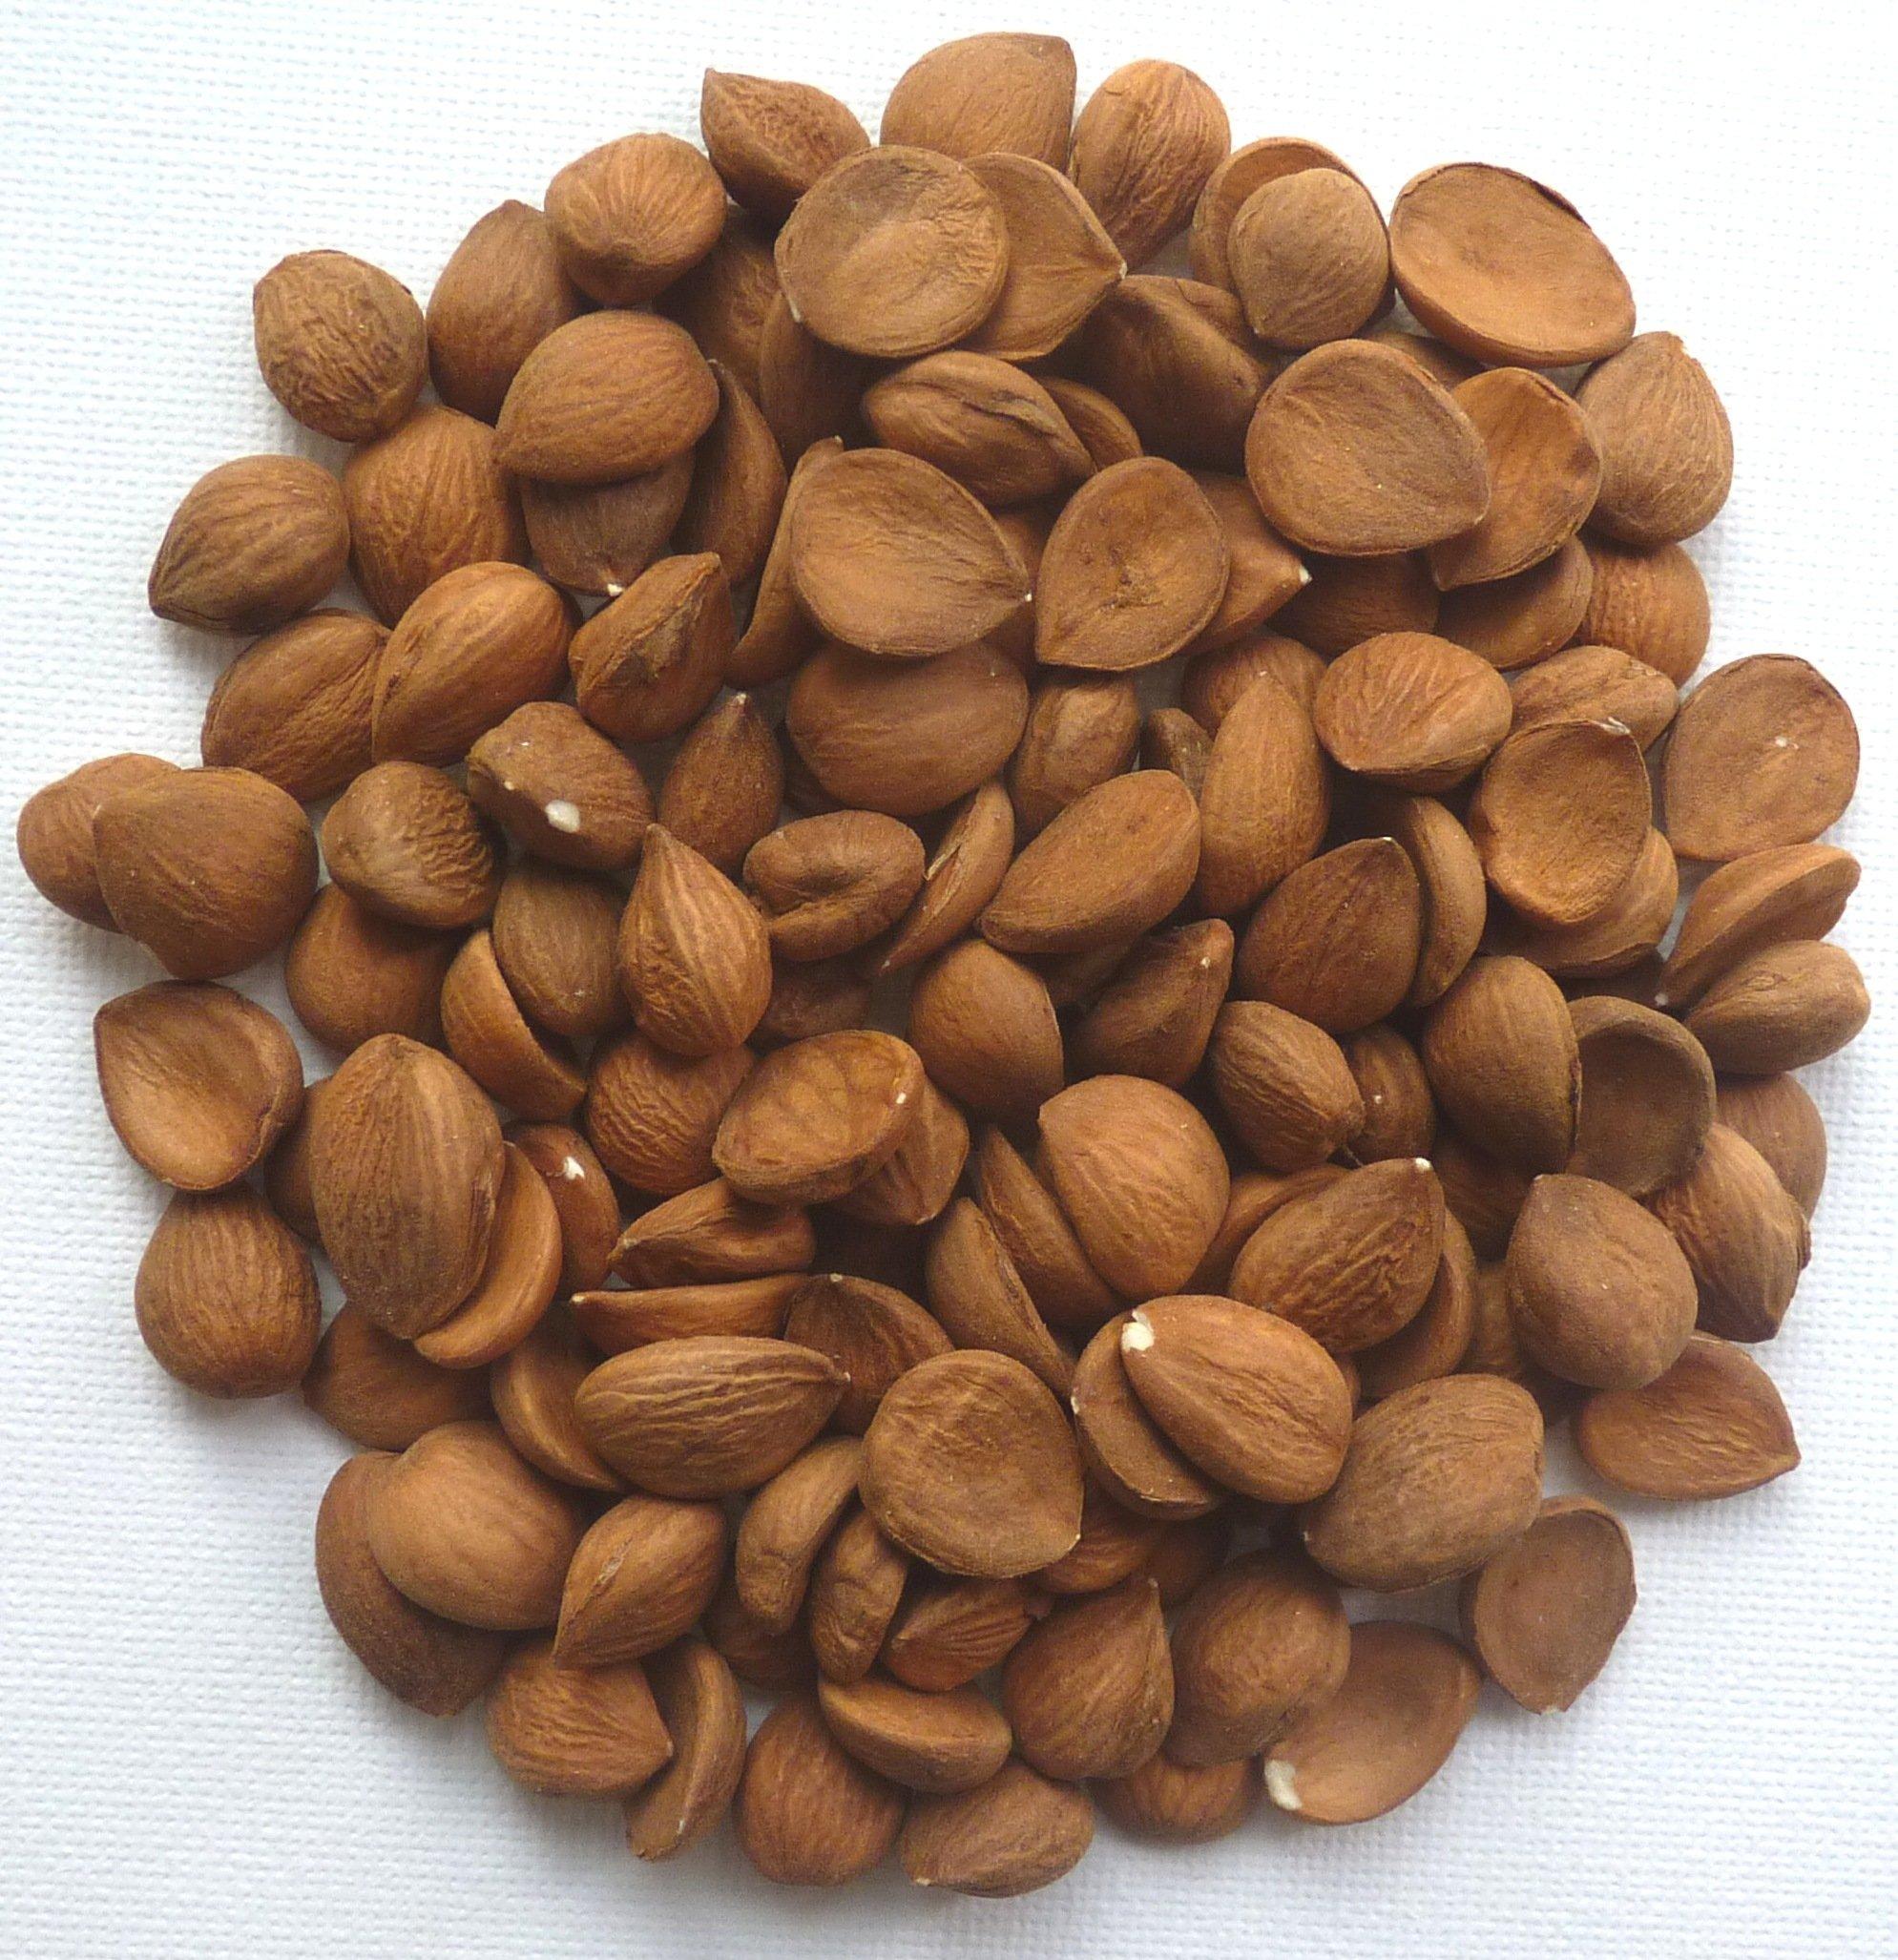 Natural Apricot Kernels Raw (Seeds) 430g Bag 1lb